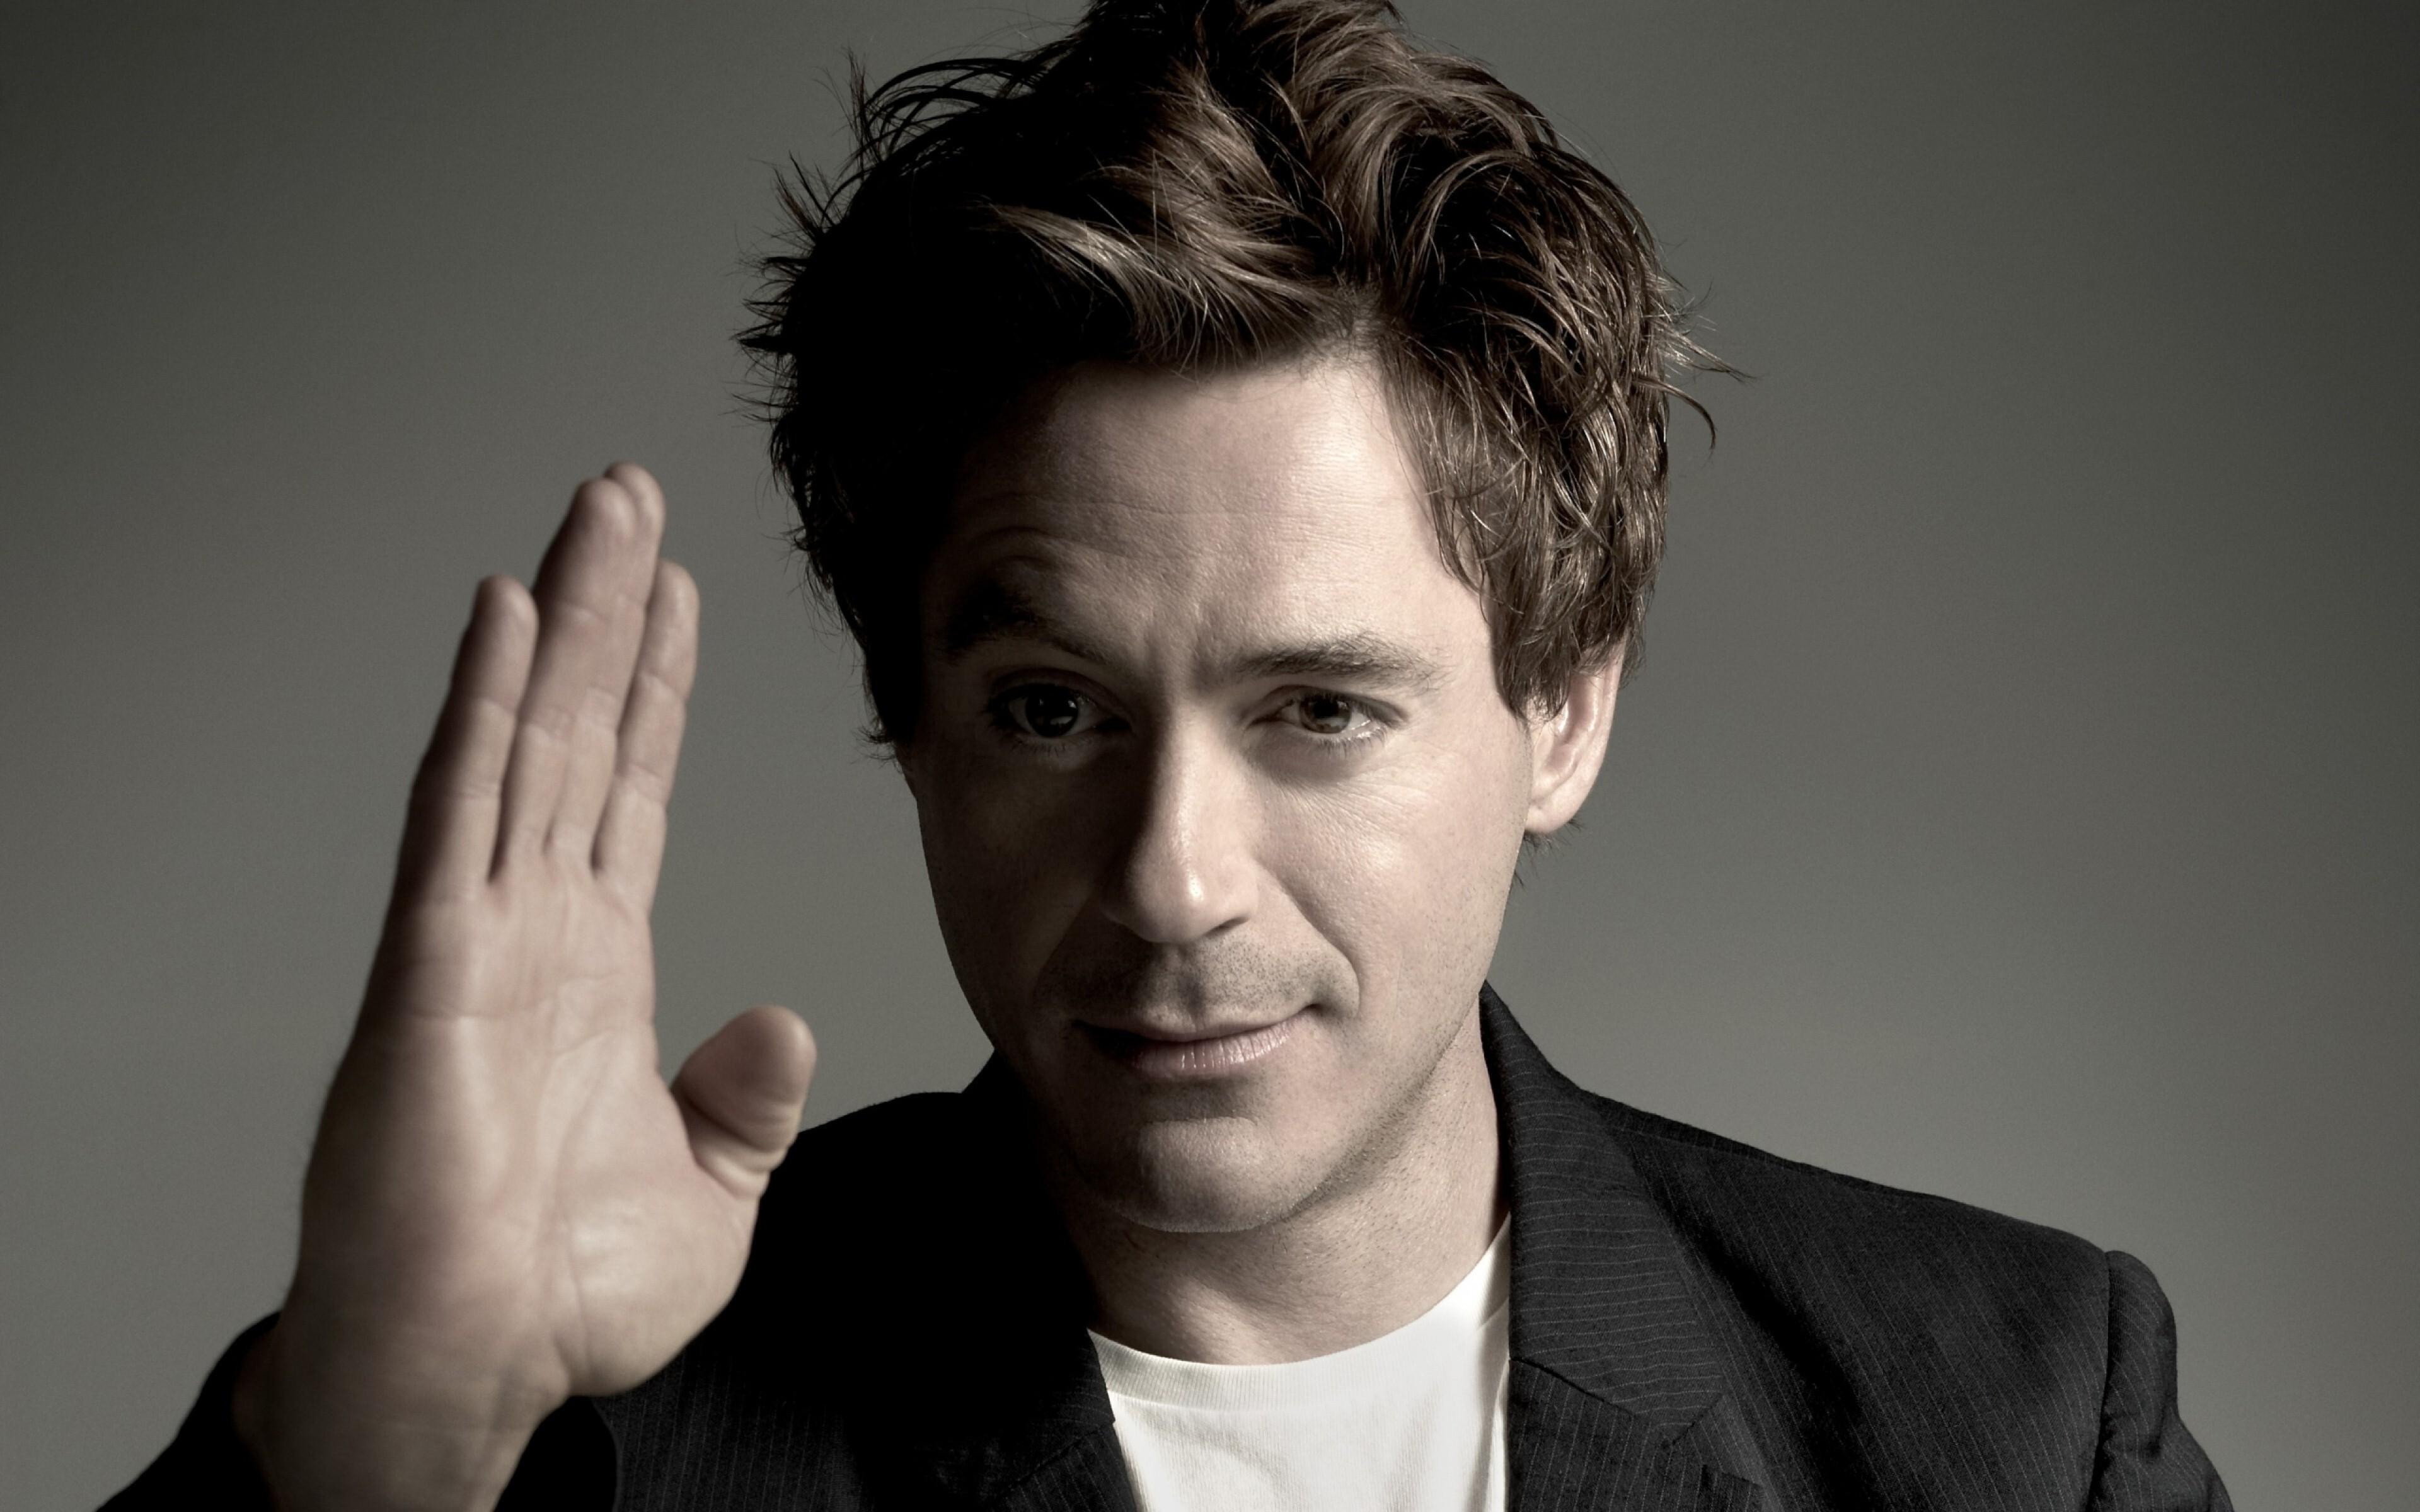 Robert Downey Jr Full Hd Wallpapers Hd Wallpapers